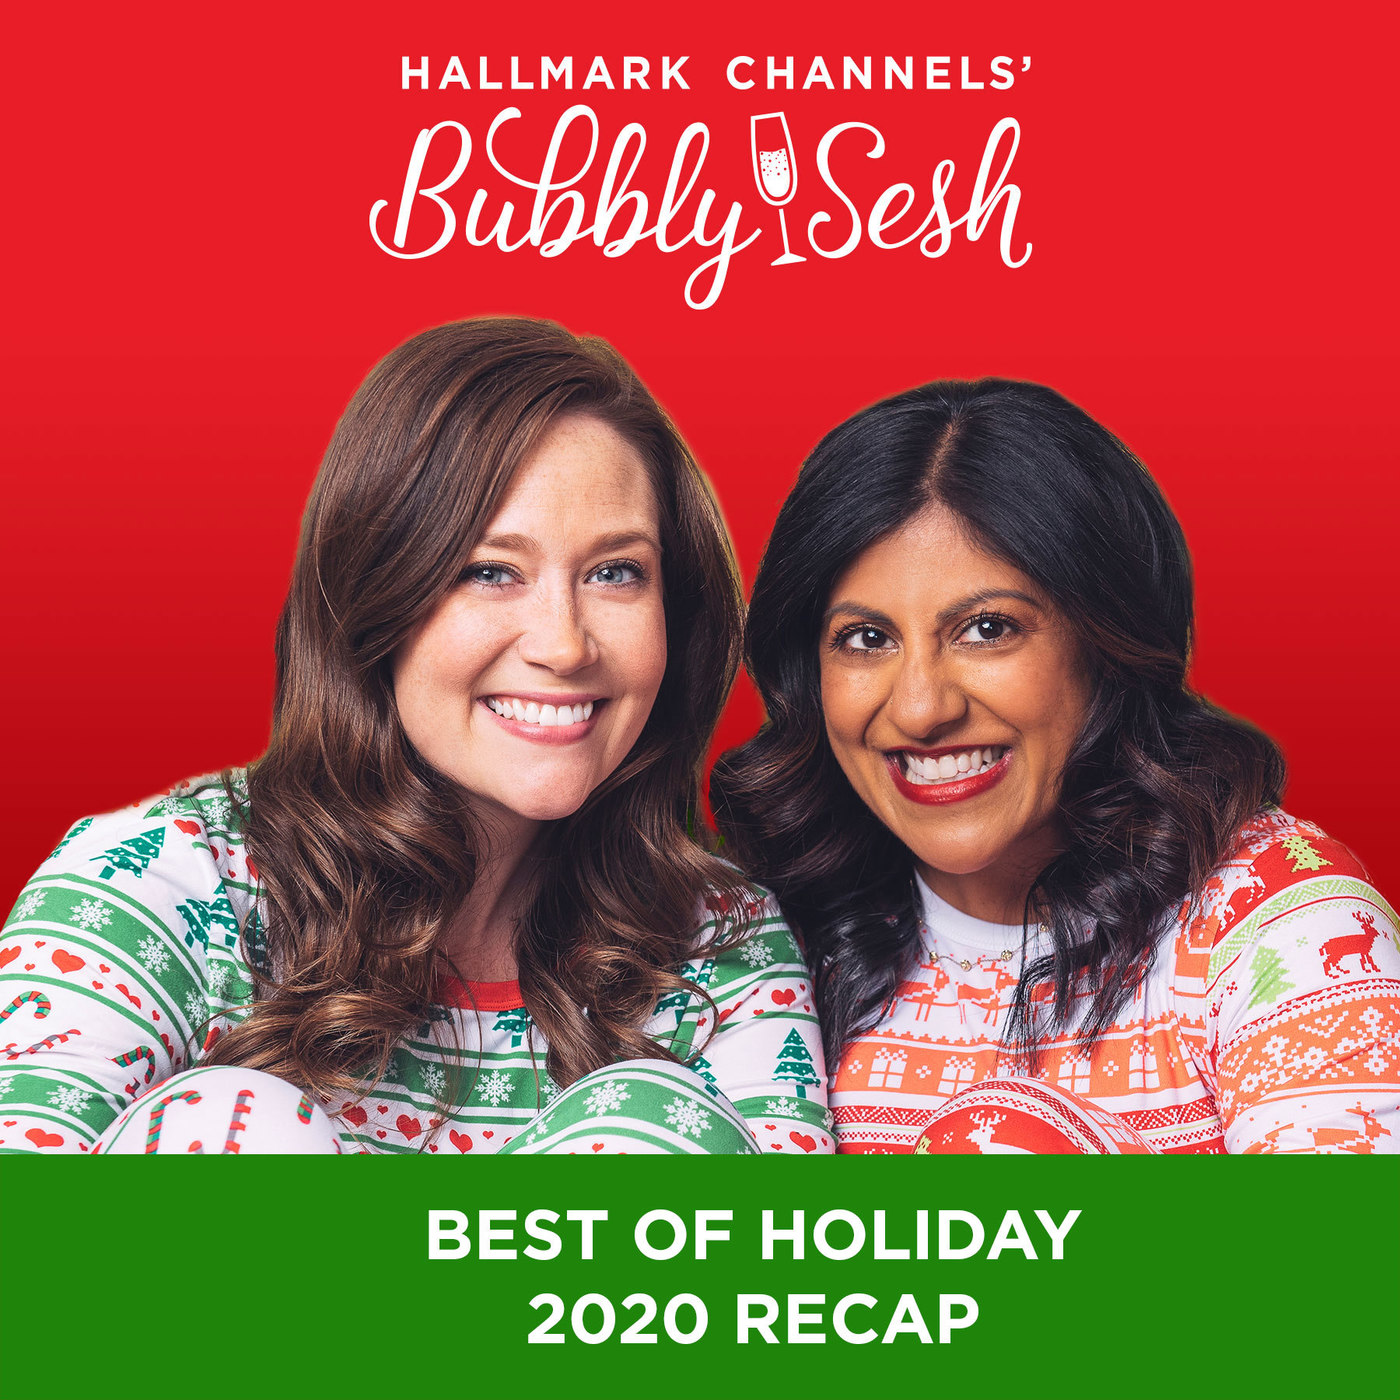 Best Of Holiday 2020 Recap